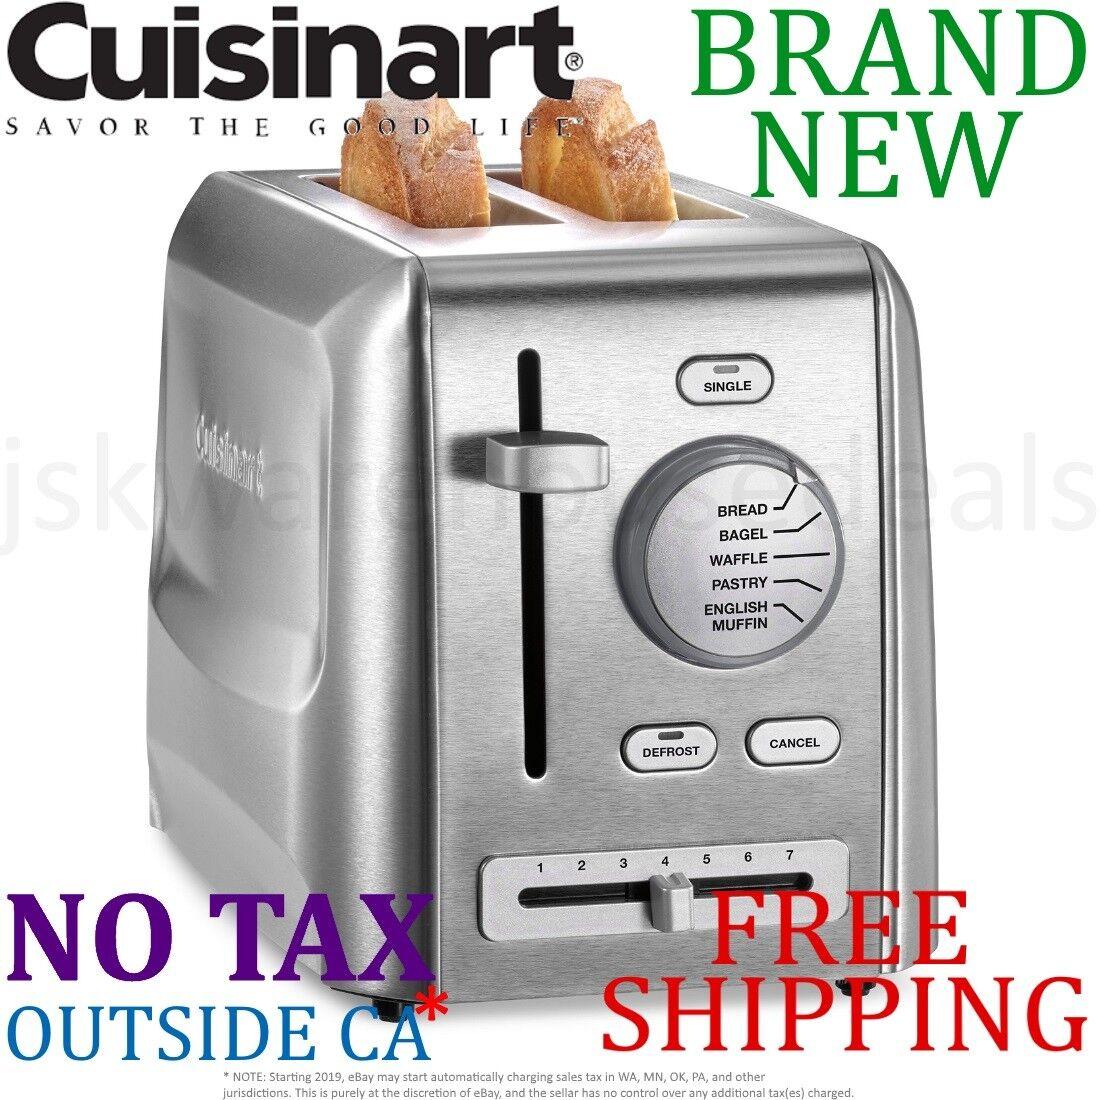 New Cuisinart 2-Slice Metal TOASTER Stainless Steel Bagel Waffle Bread 7 Mode